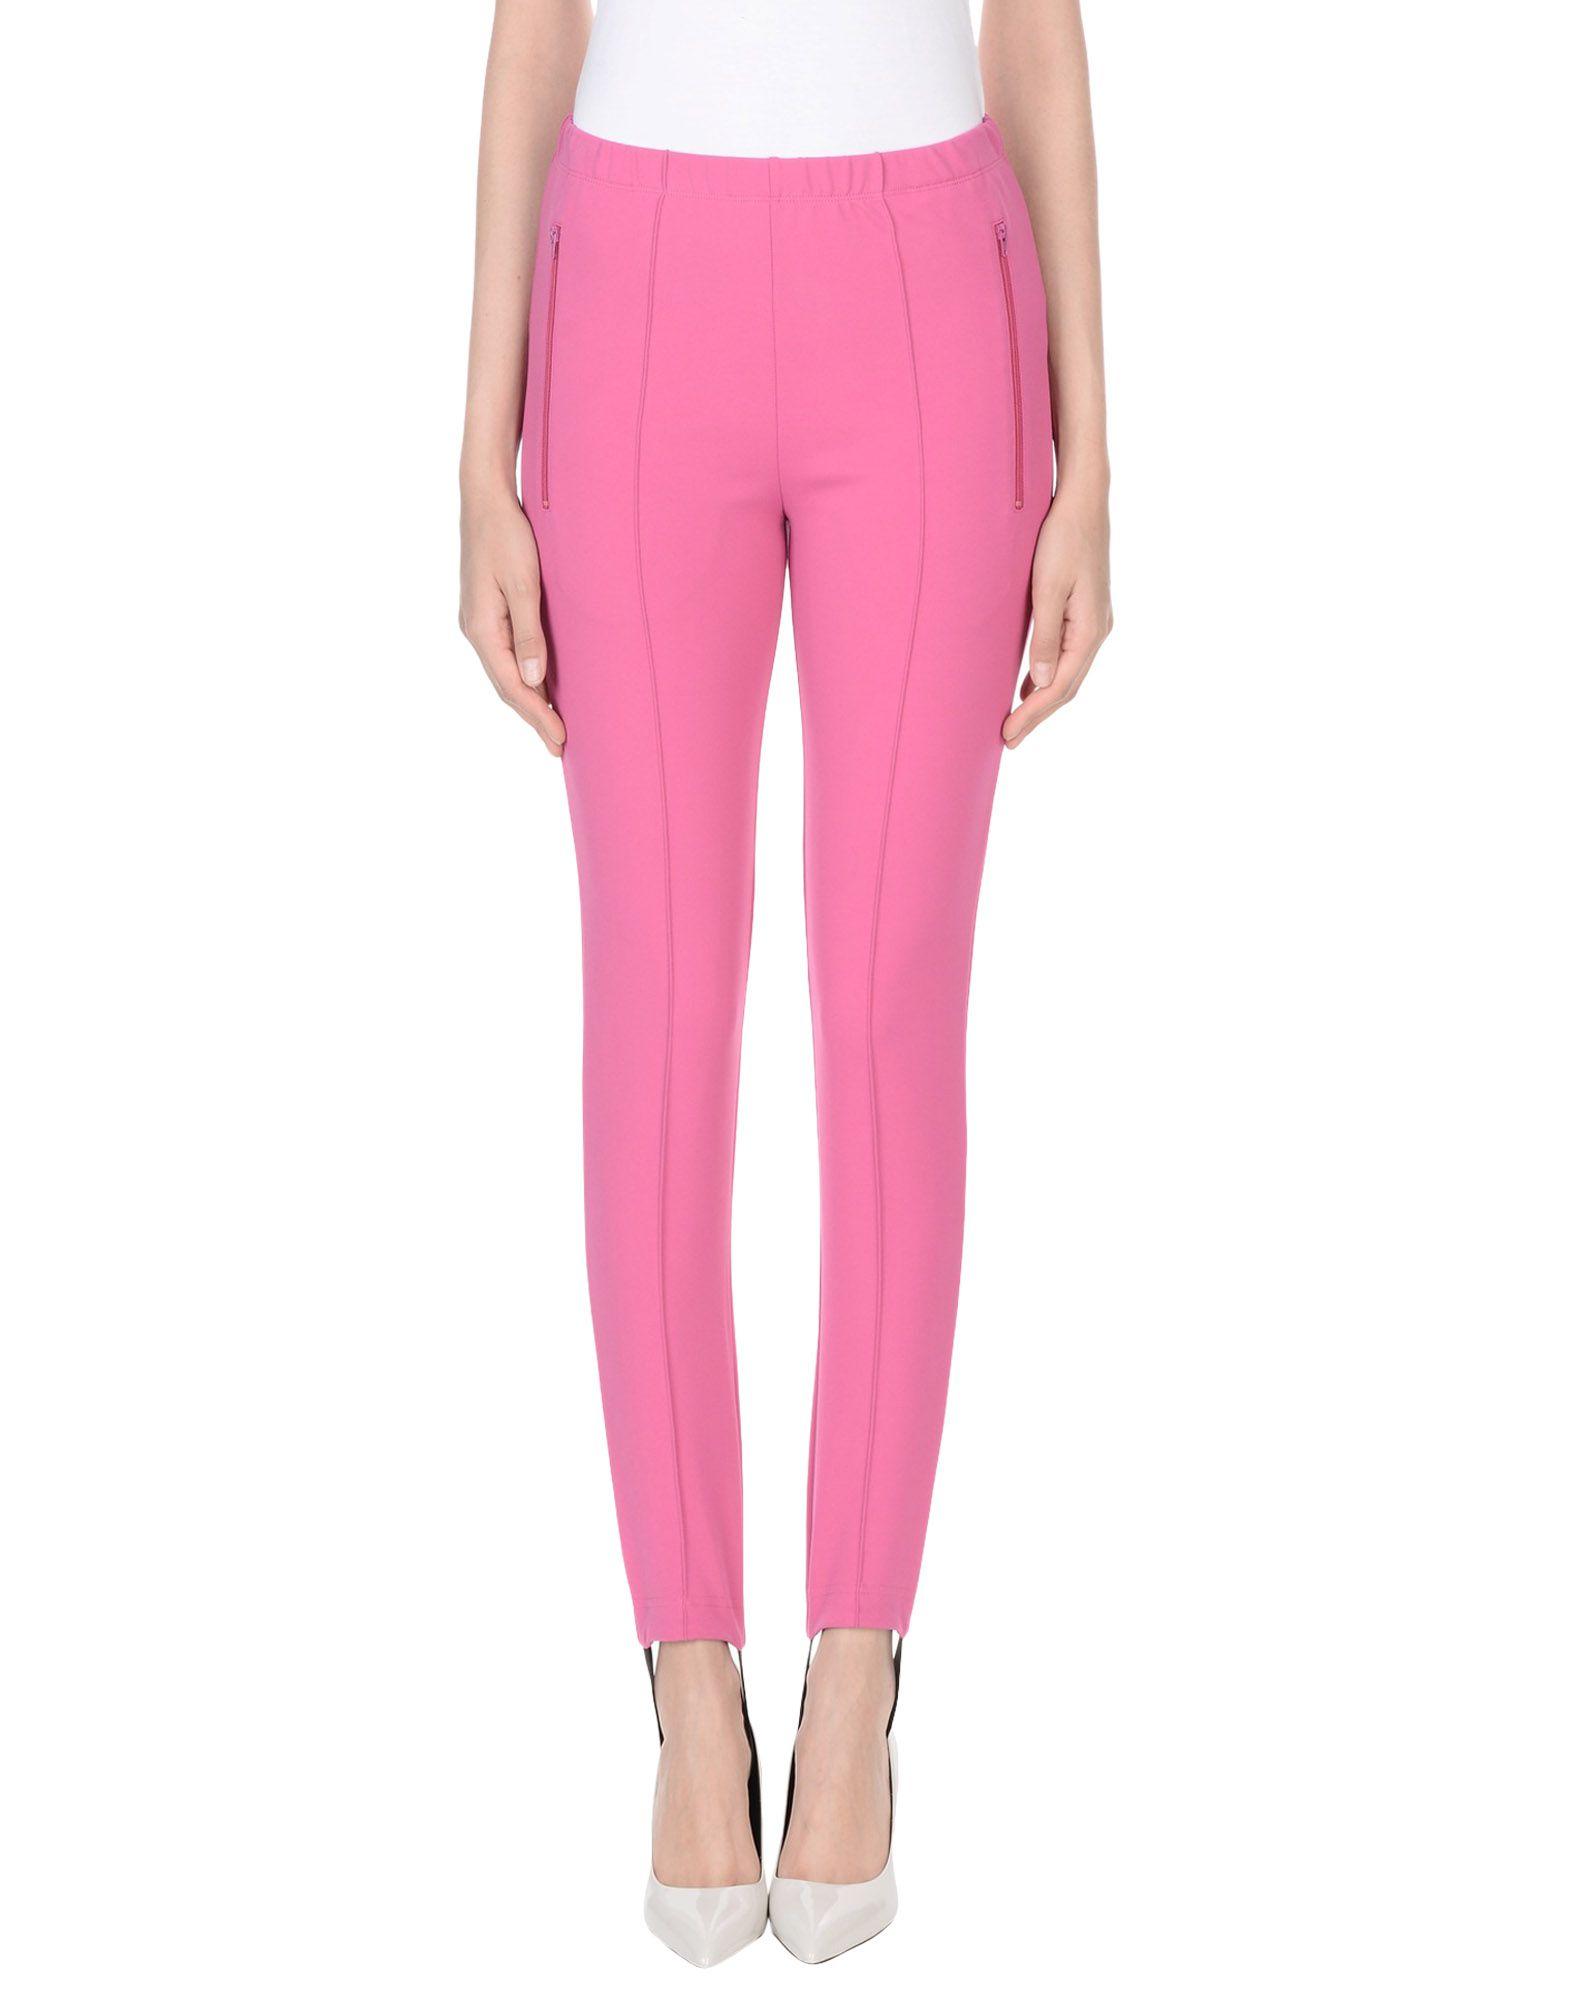 Pantalone Balenciaga Donna - Acquista online su FTKrljD3oQ